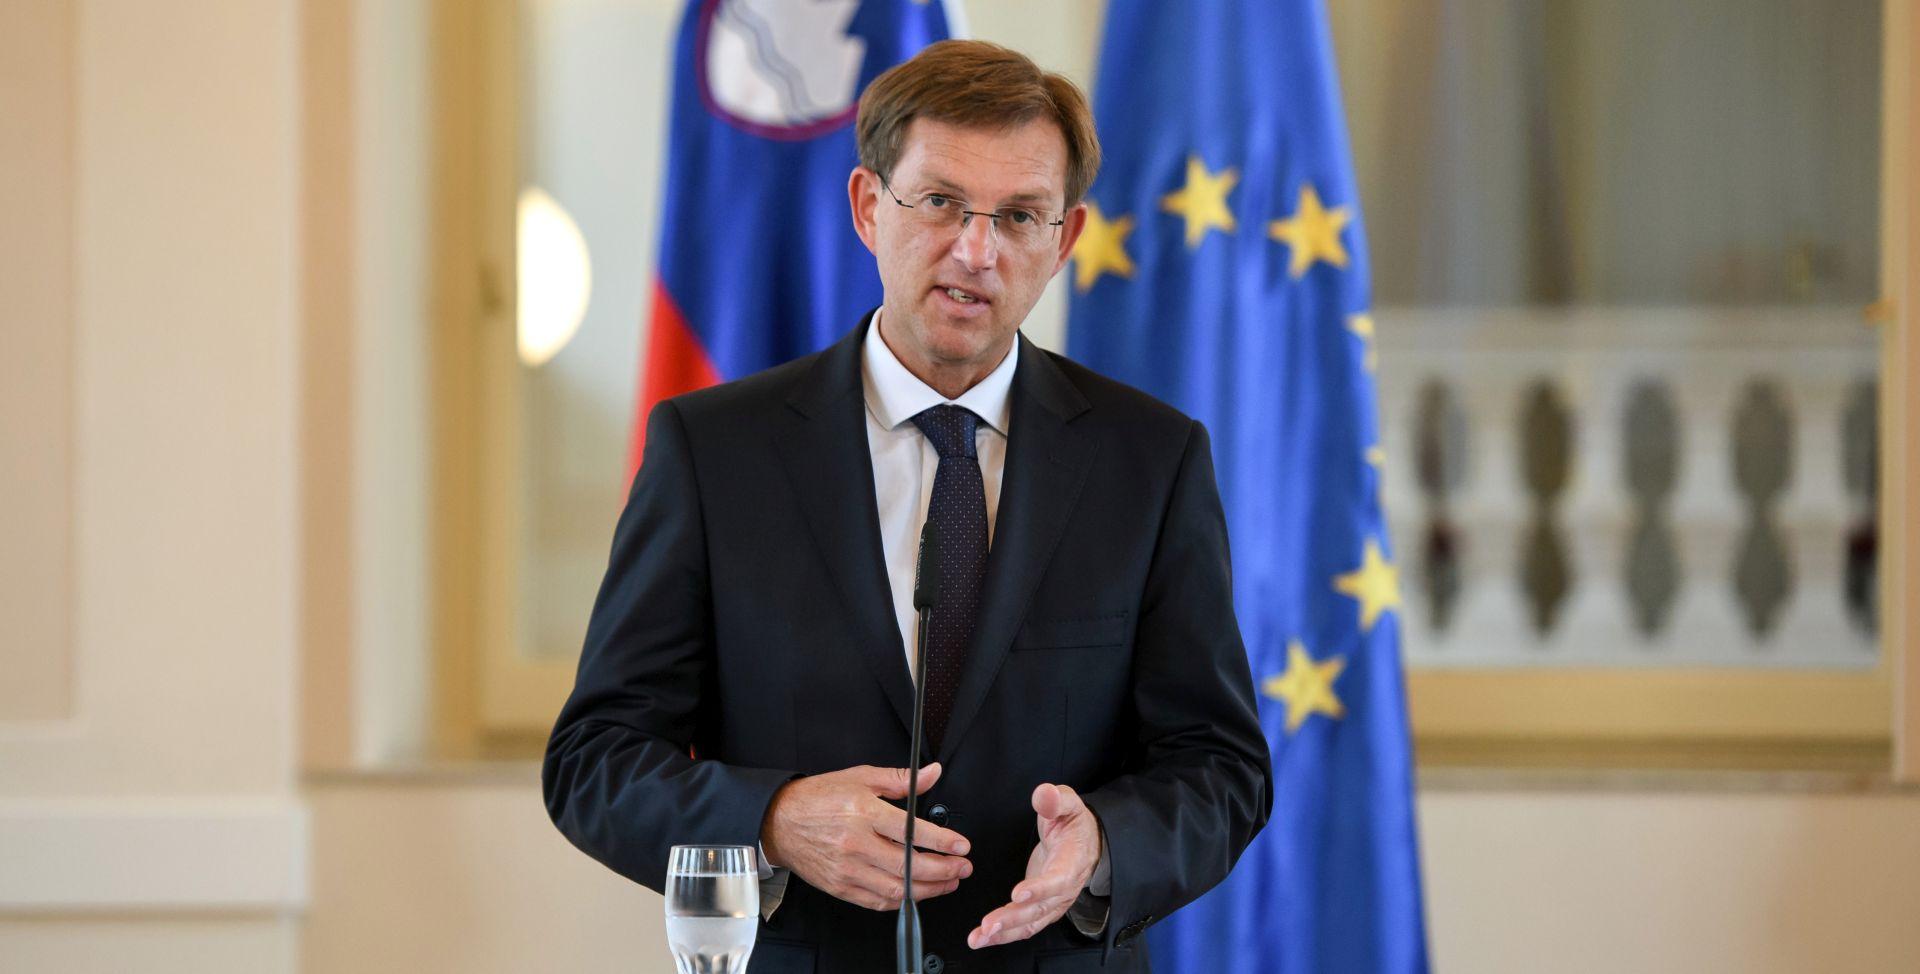 PREGOVORI ĆE SE NASTAVITI: Slovenski premijer je ogorčen štrajkom policije